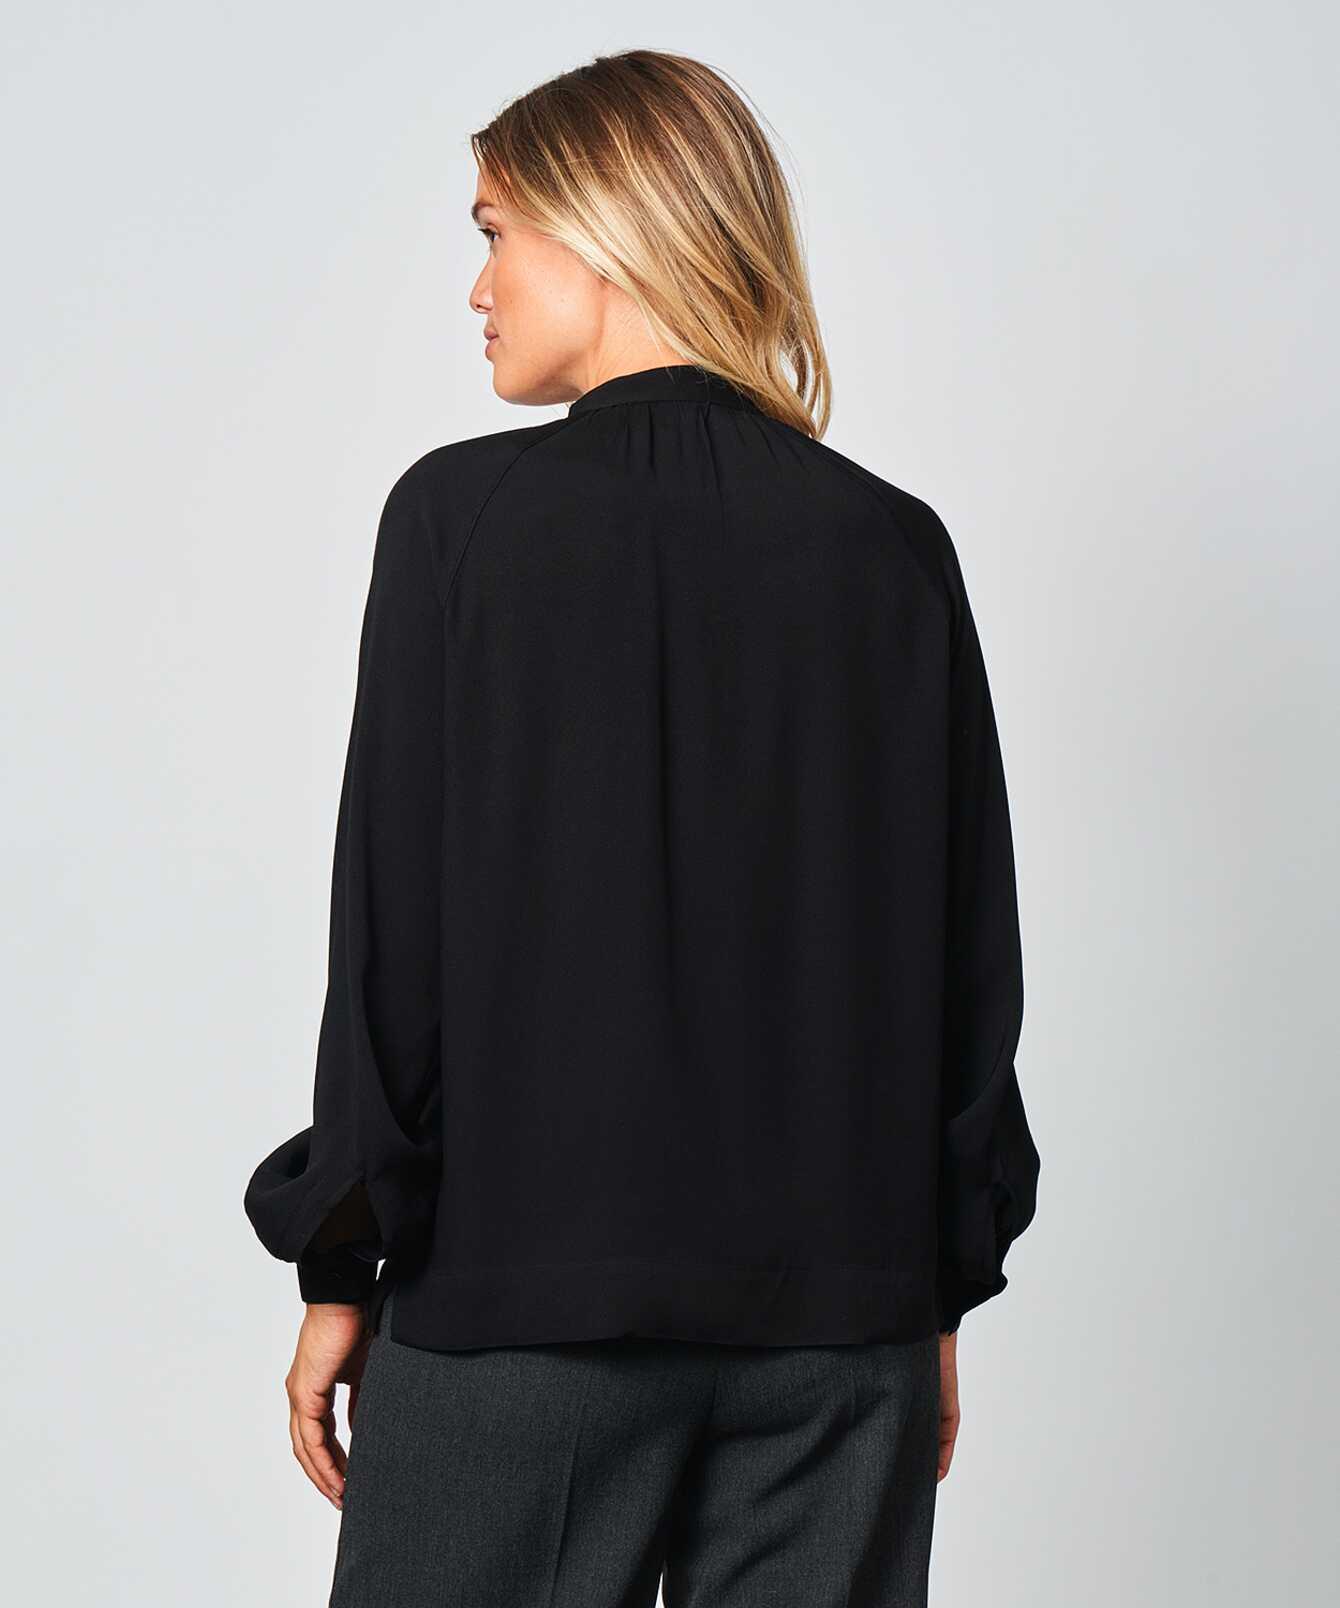 Shirt Mira Verona Black The Shirt Factory